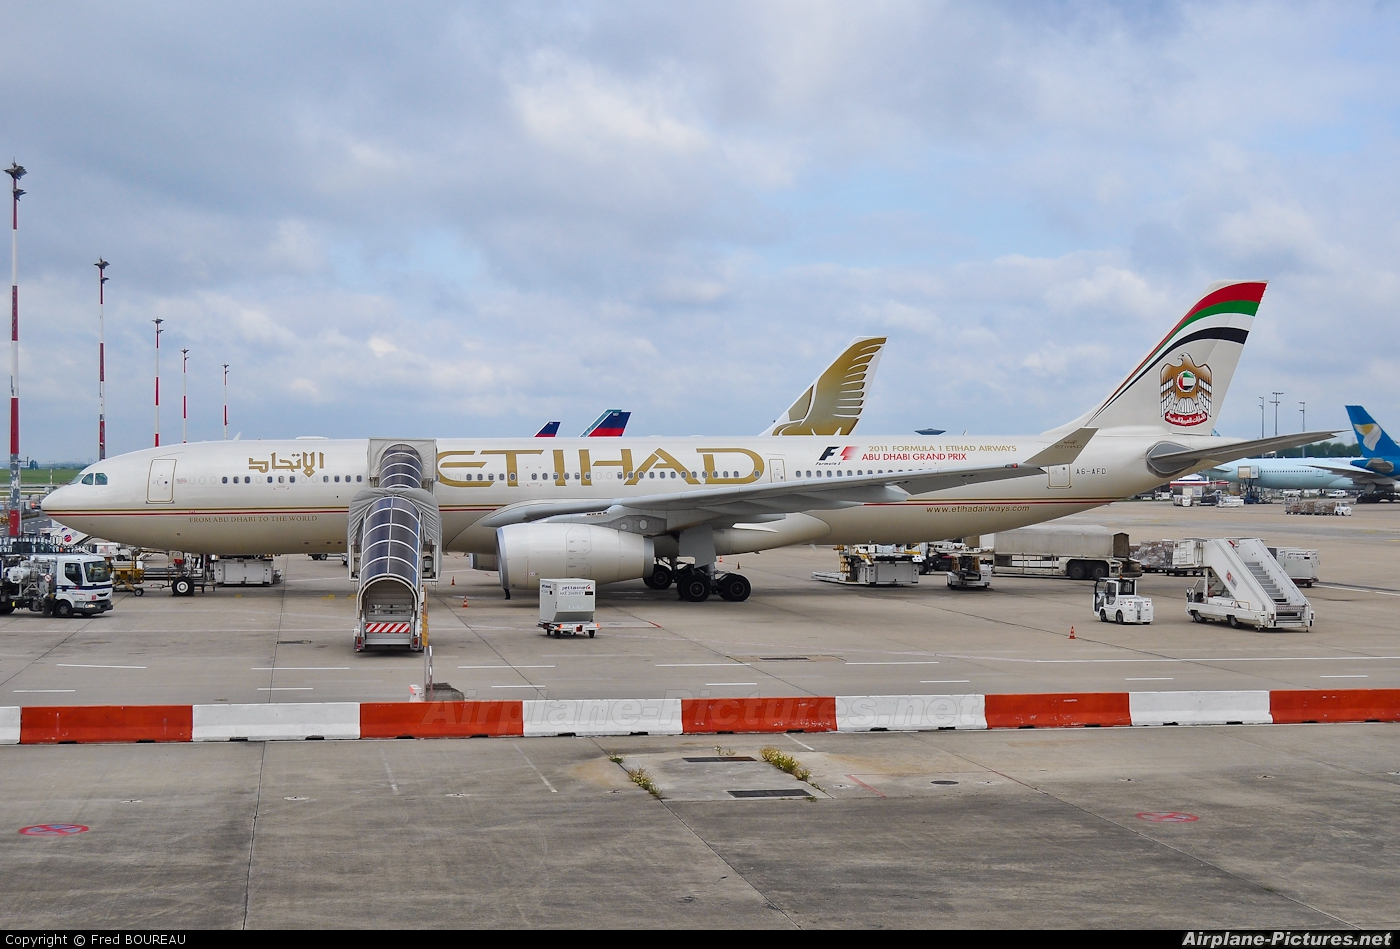 Etihad Airways A6-AFD aircraft at Paris - Charles de Gaulle